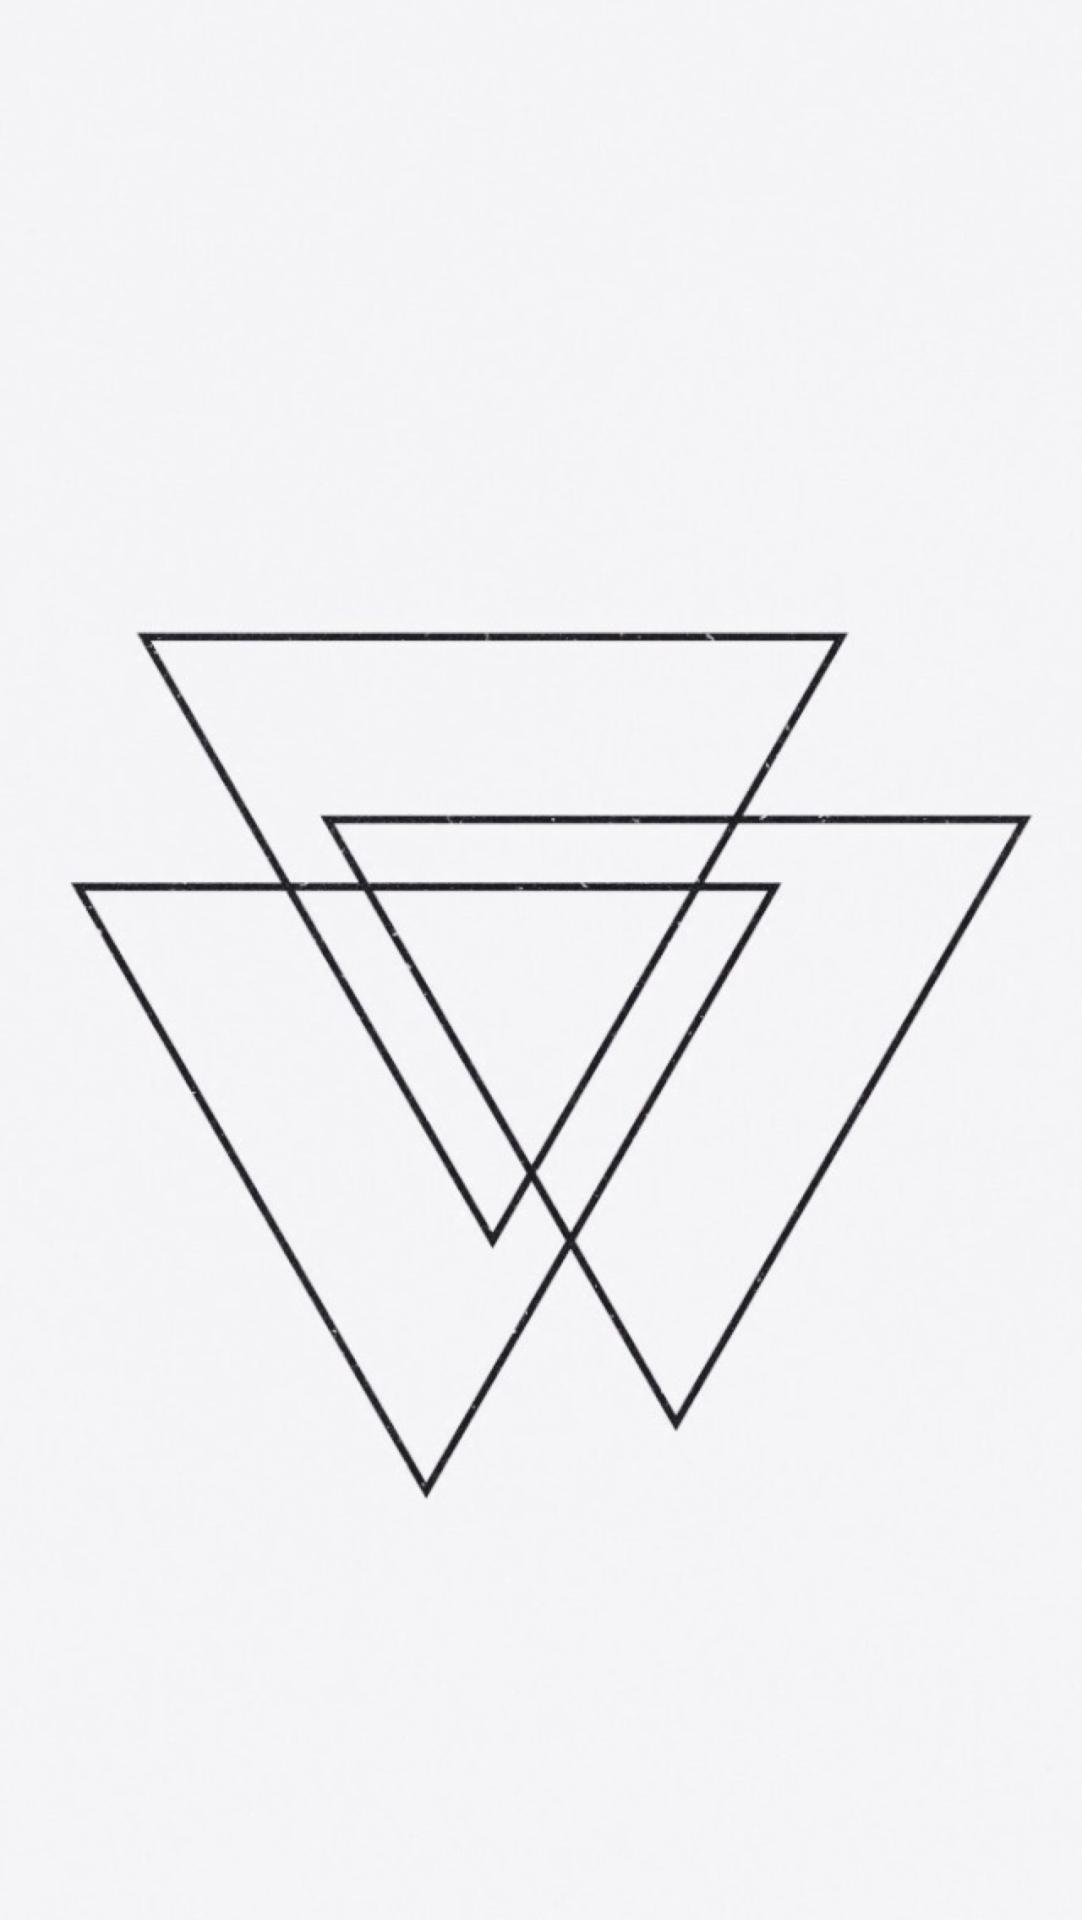 Triangles Ssomebackgroundstumblrcom Cosy Pinterest